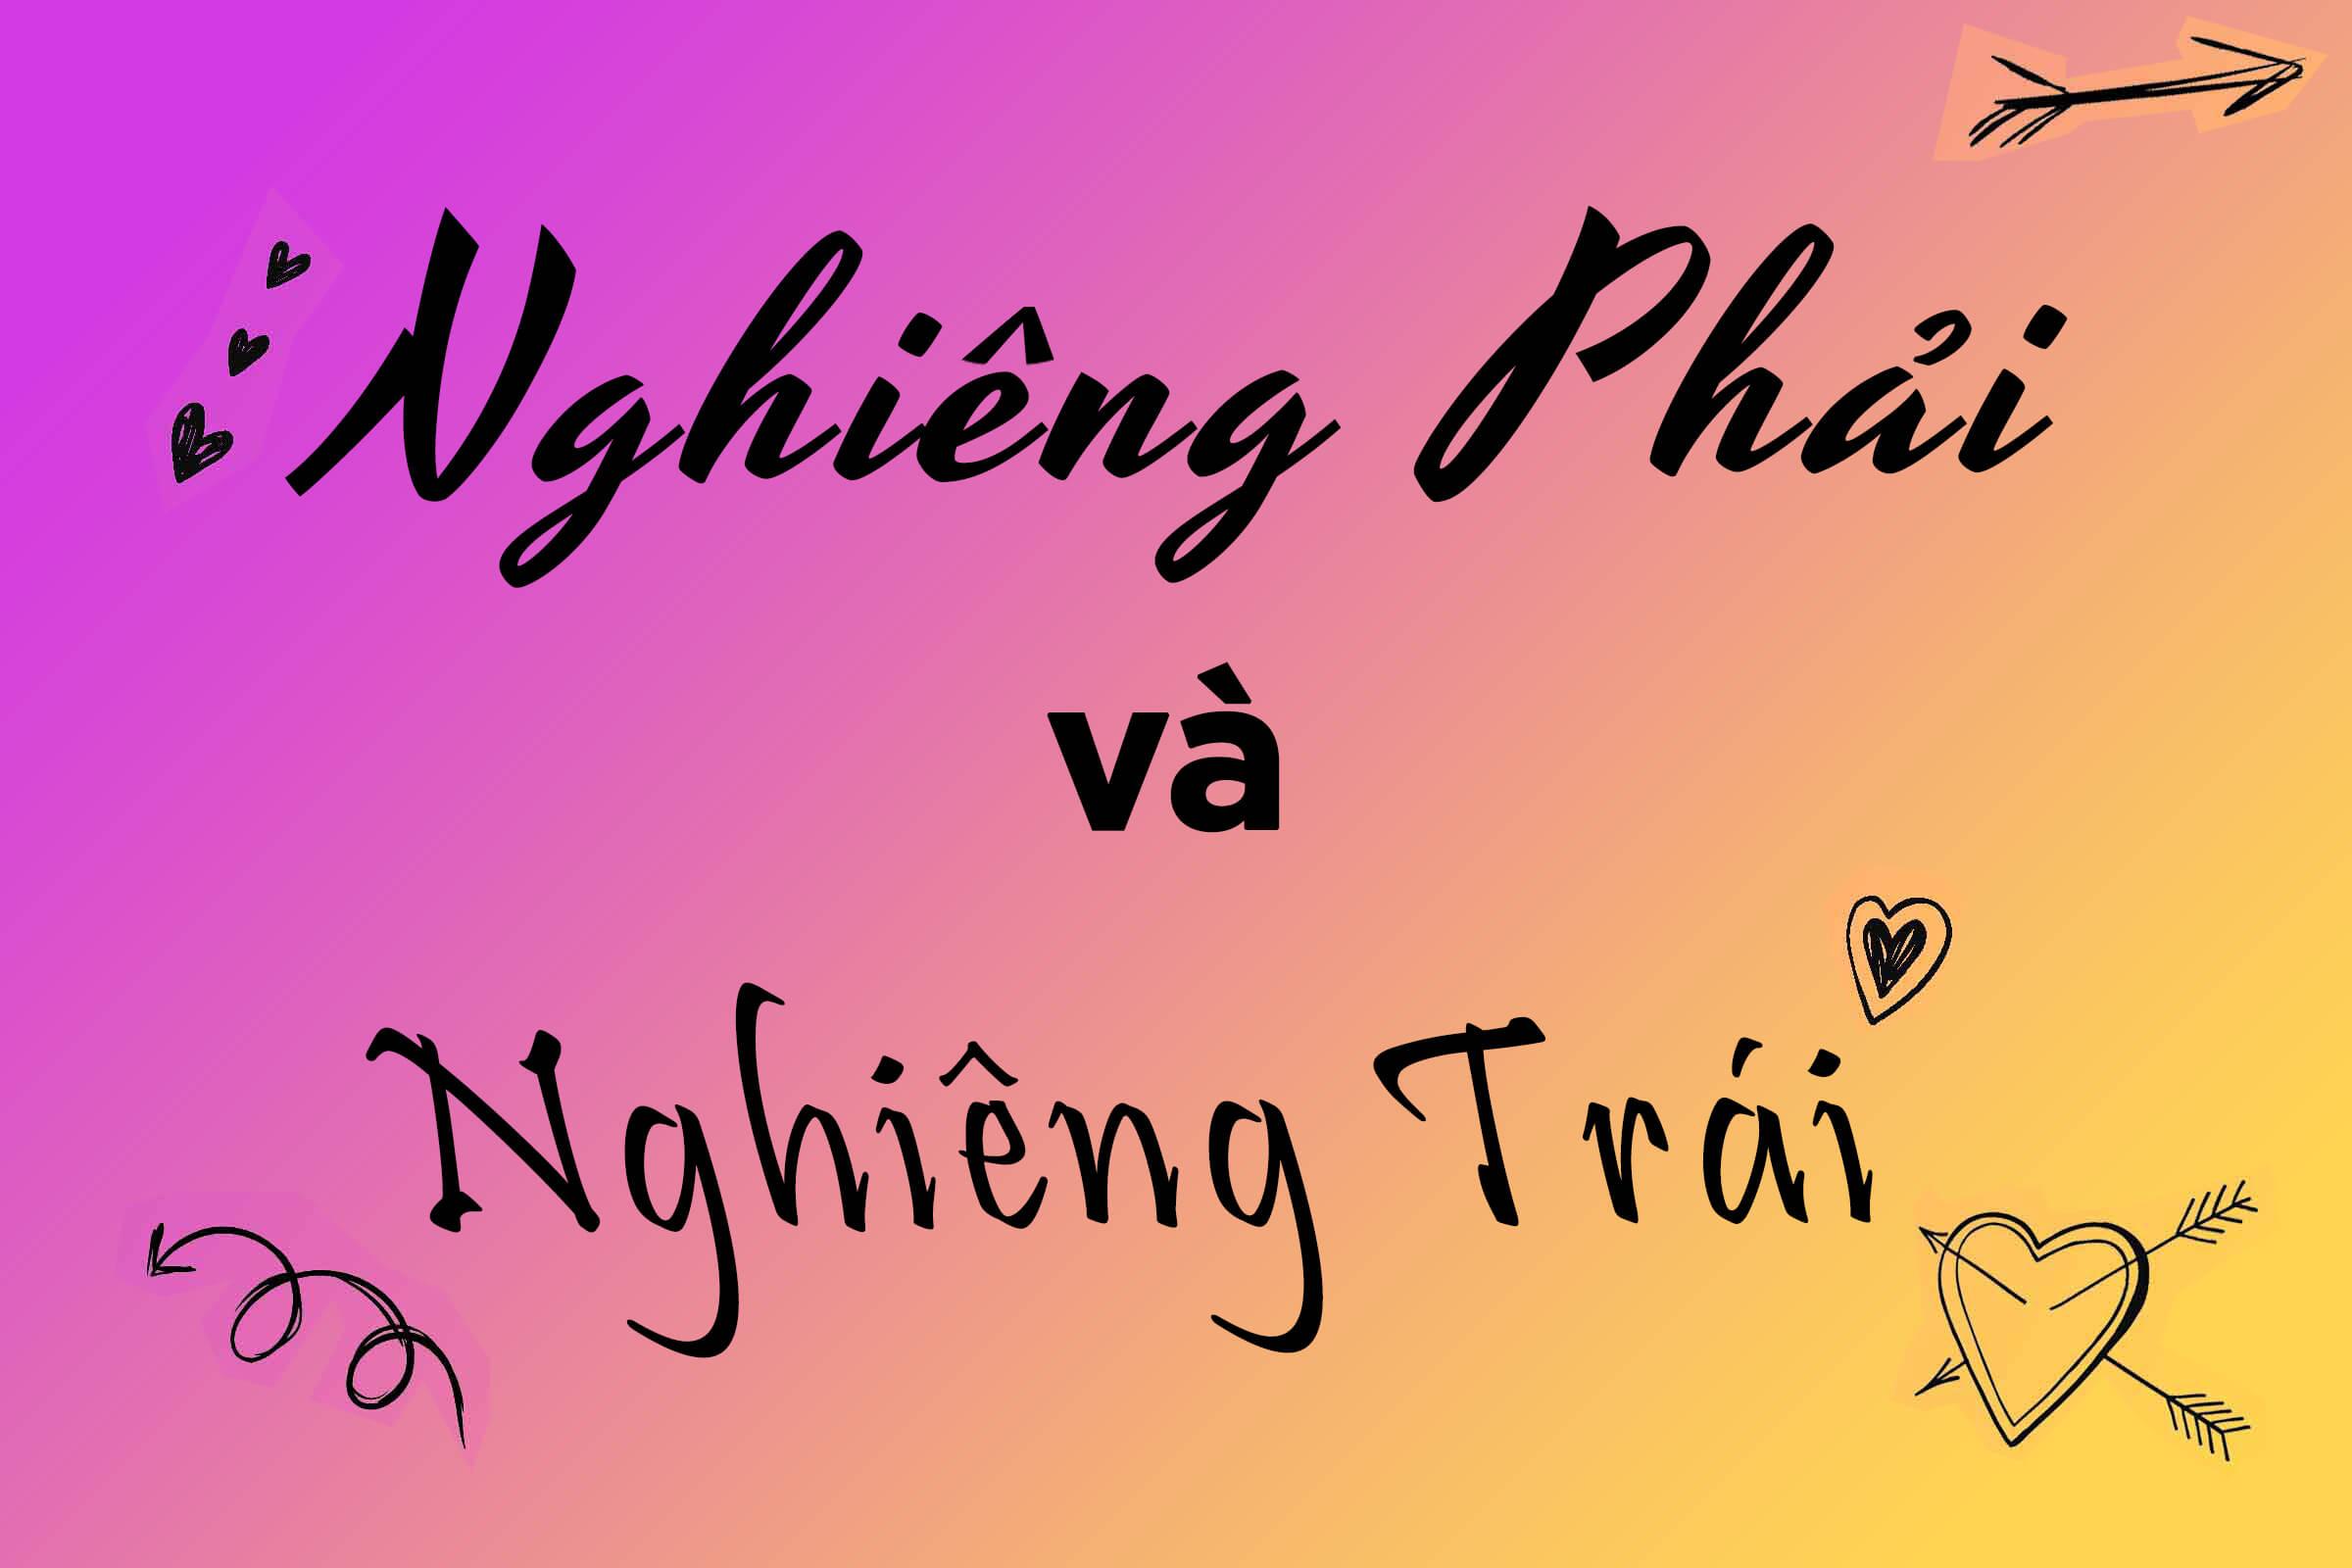 nhin-chu-doan-tinh-cach-huong-di-moi-giup-sep-doc-vi-nhan-vien-3